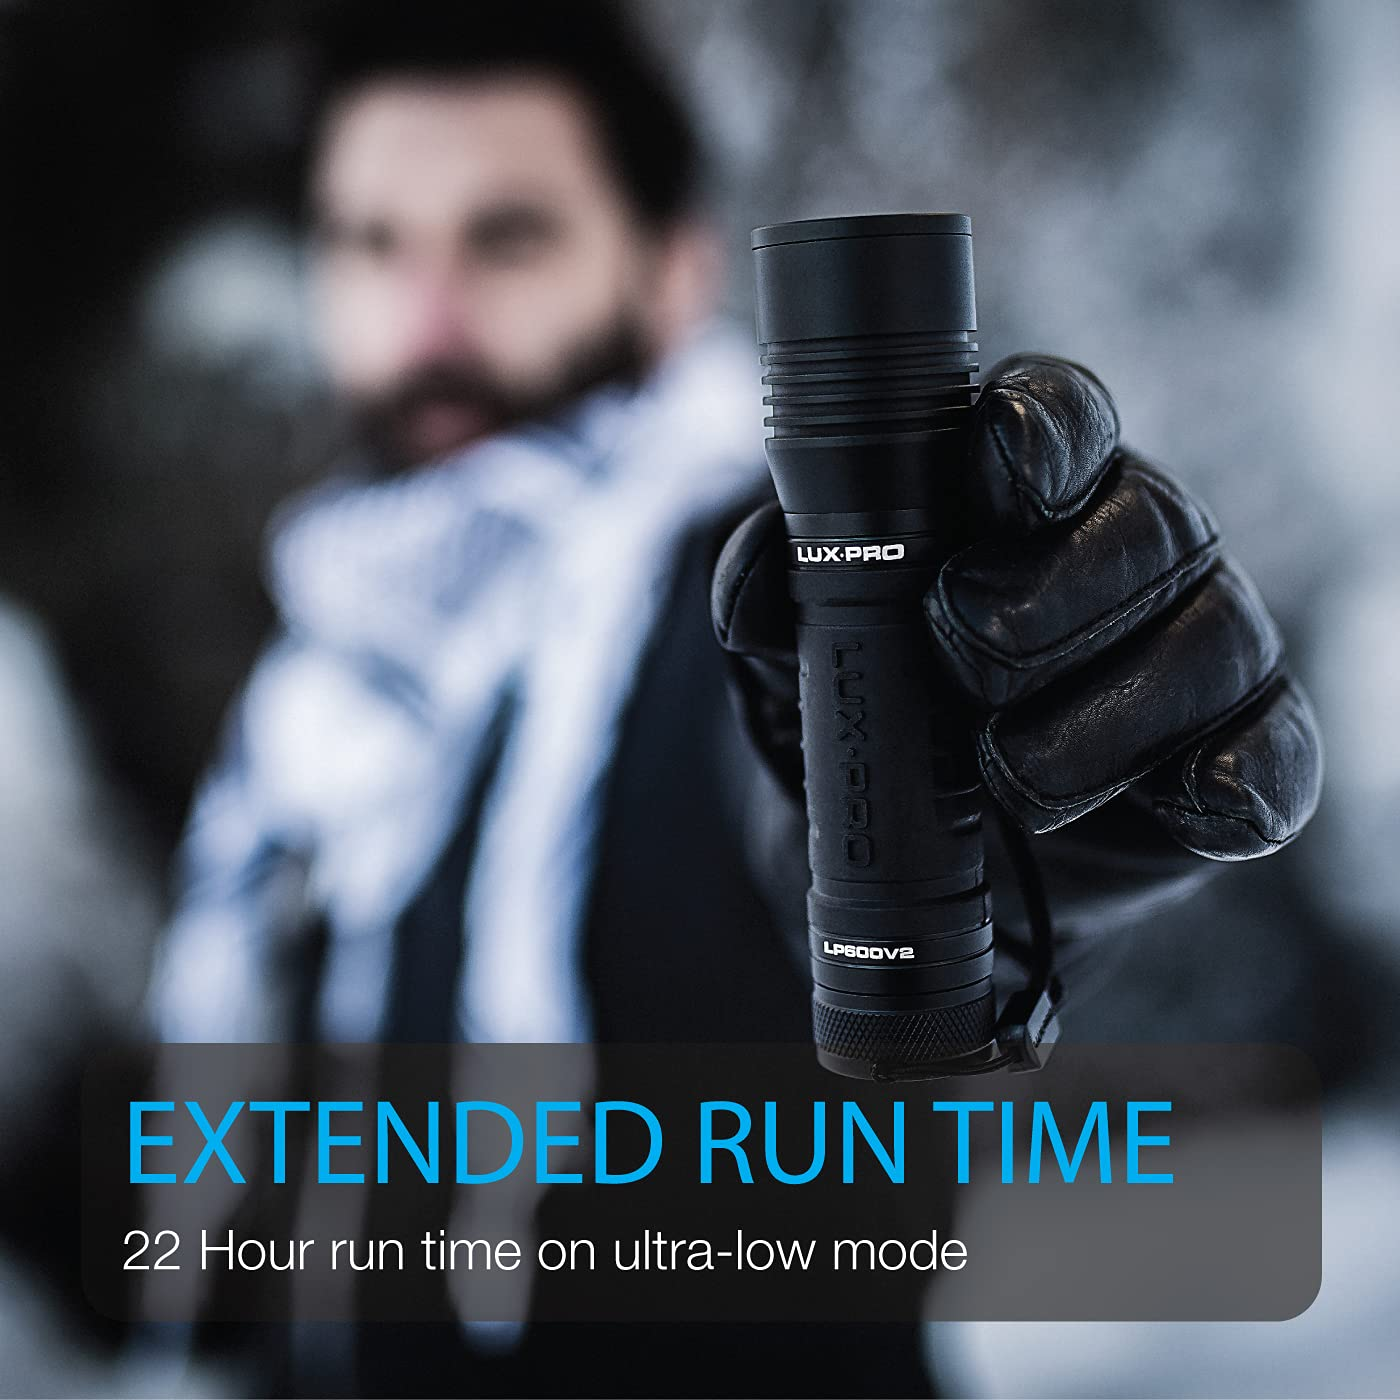 Lux Pro LP600V2 Water Resistant 400 Lumen Tactical LED Flashlight for sale online